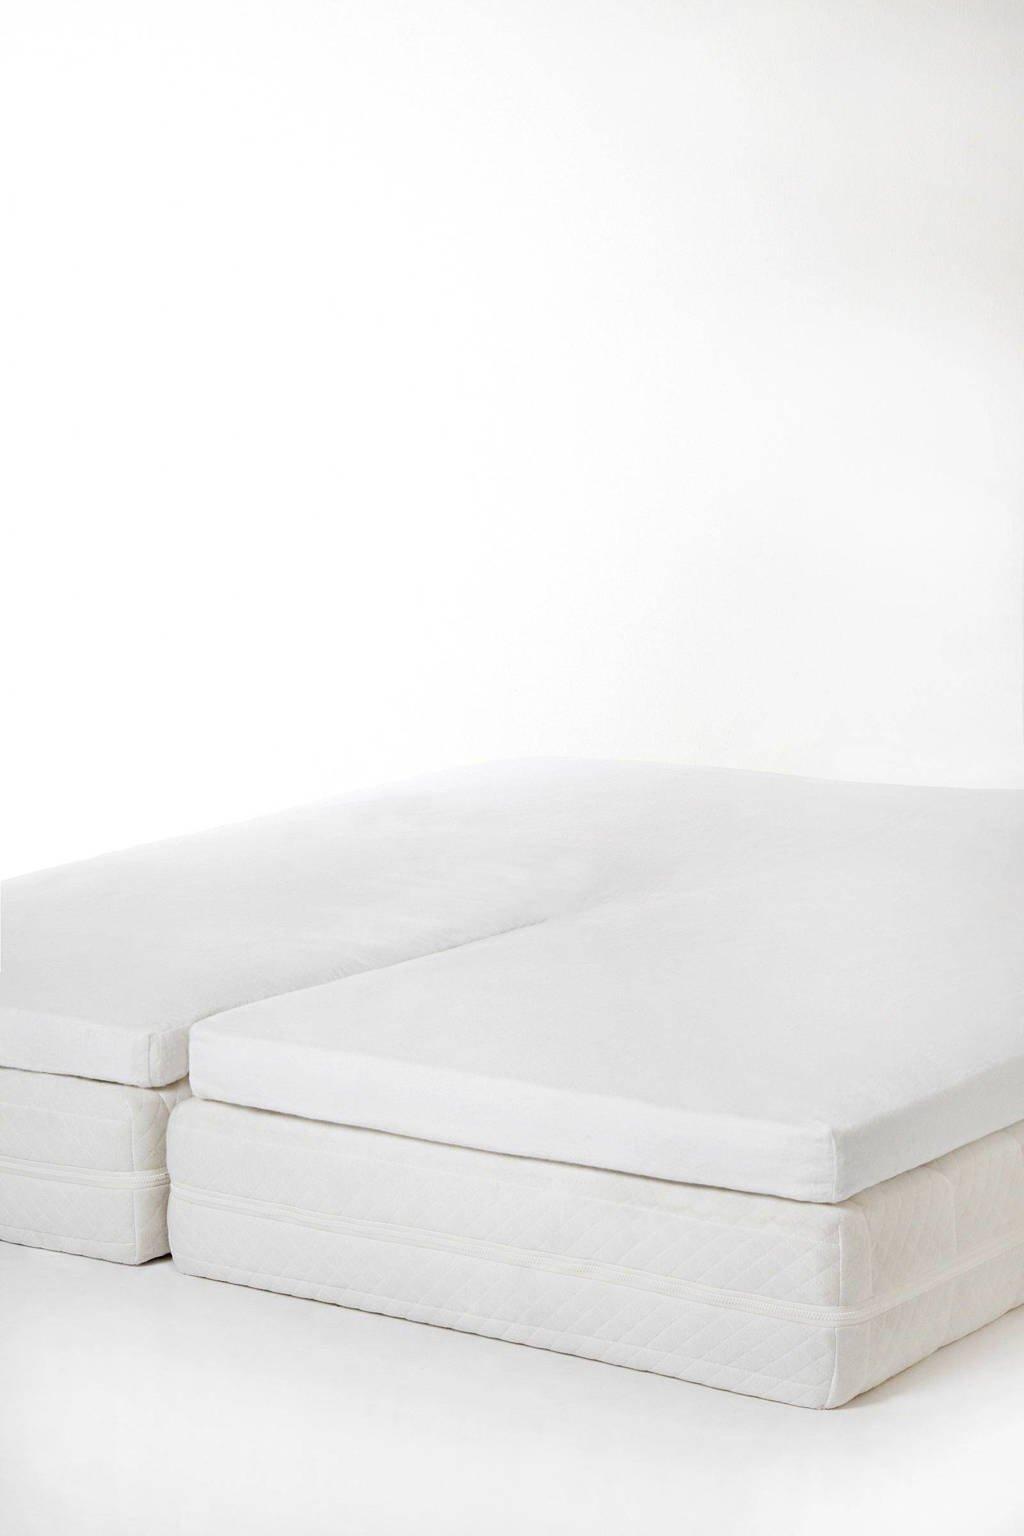 whkmp's own molton hoeslaken split topmatras (tot 7 cm matras), Wit